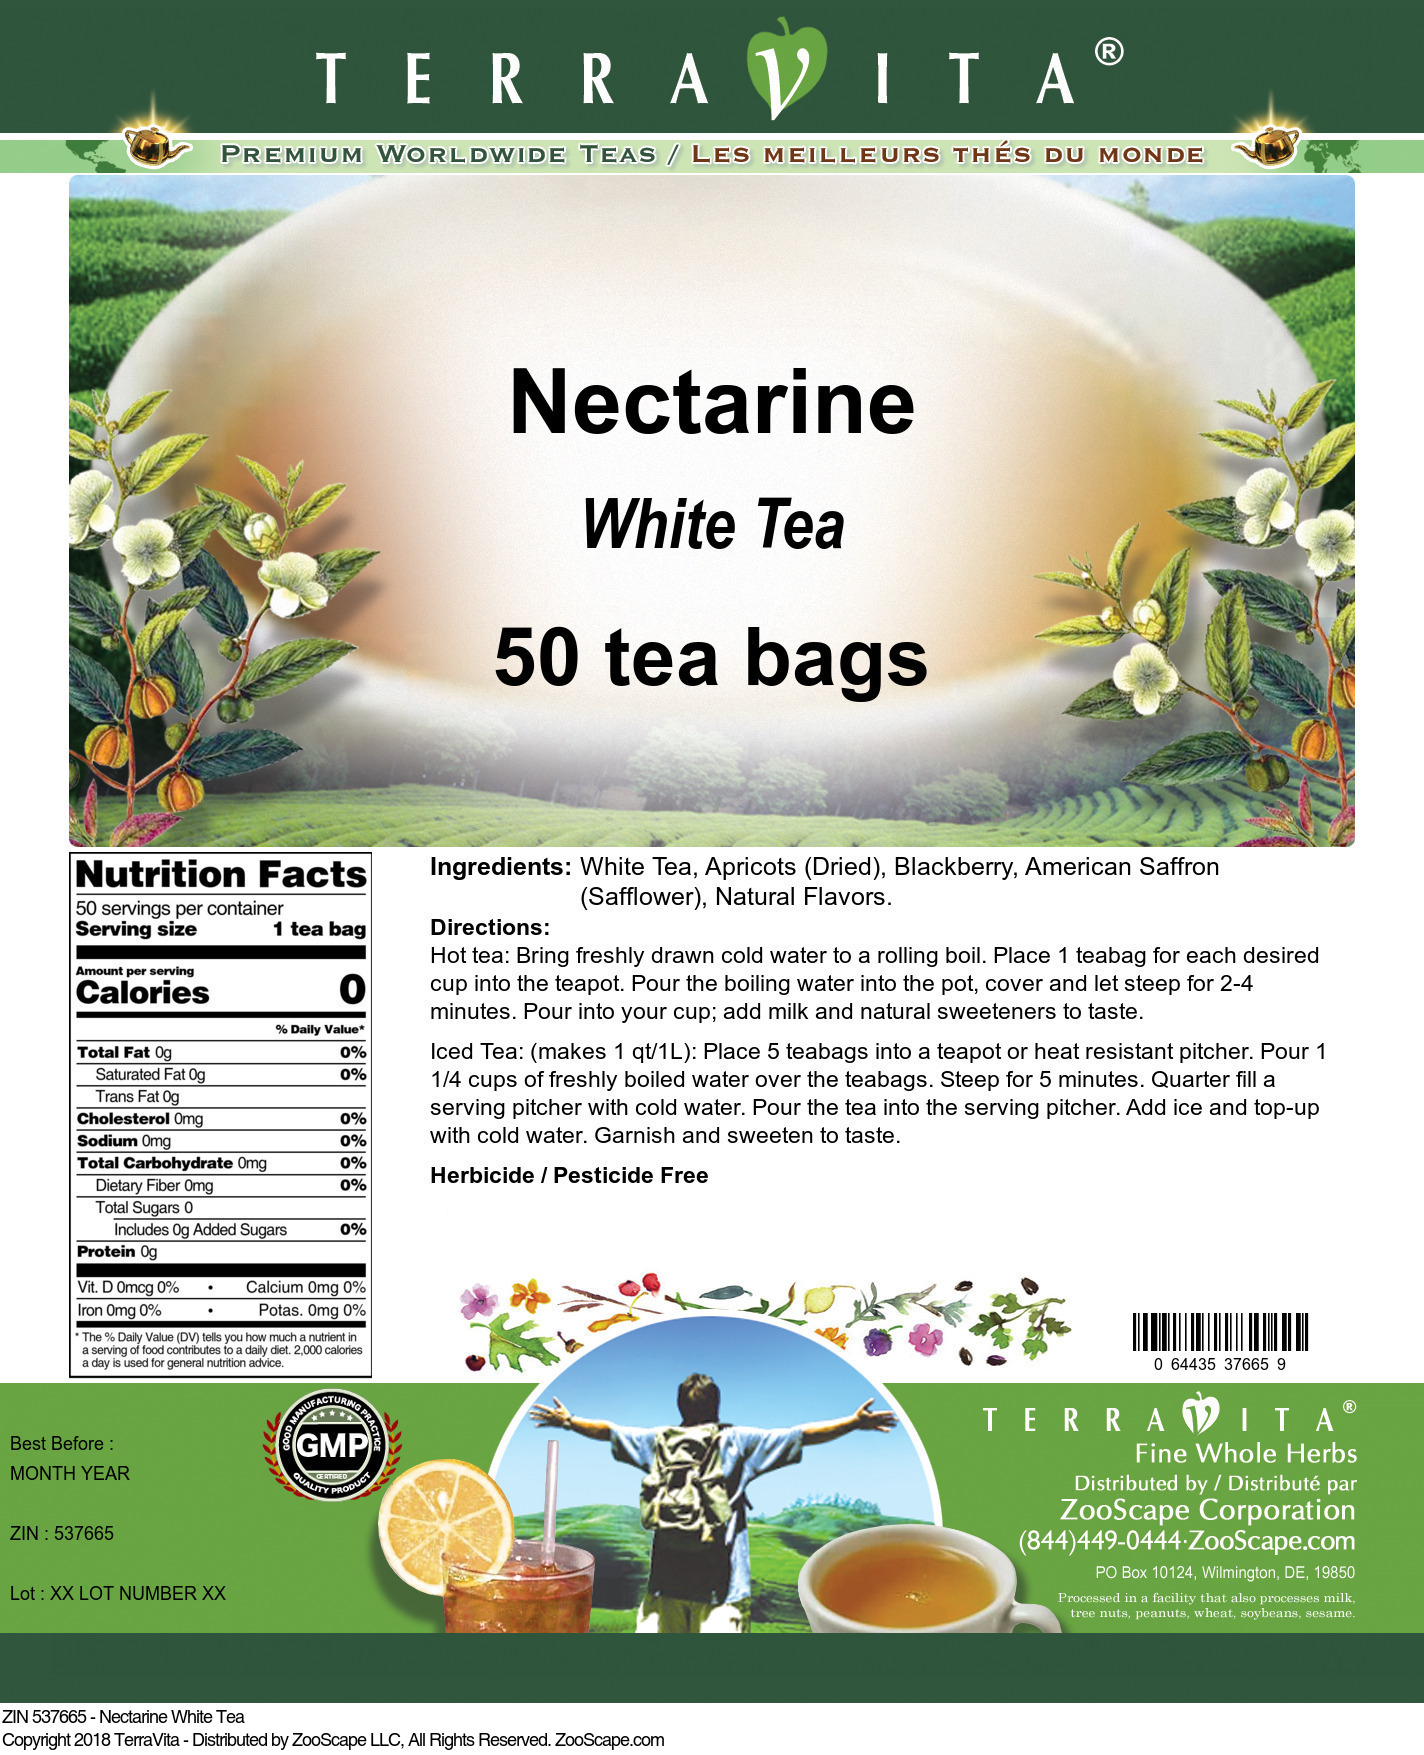 Nectarine White Tea